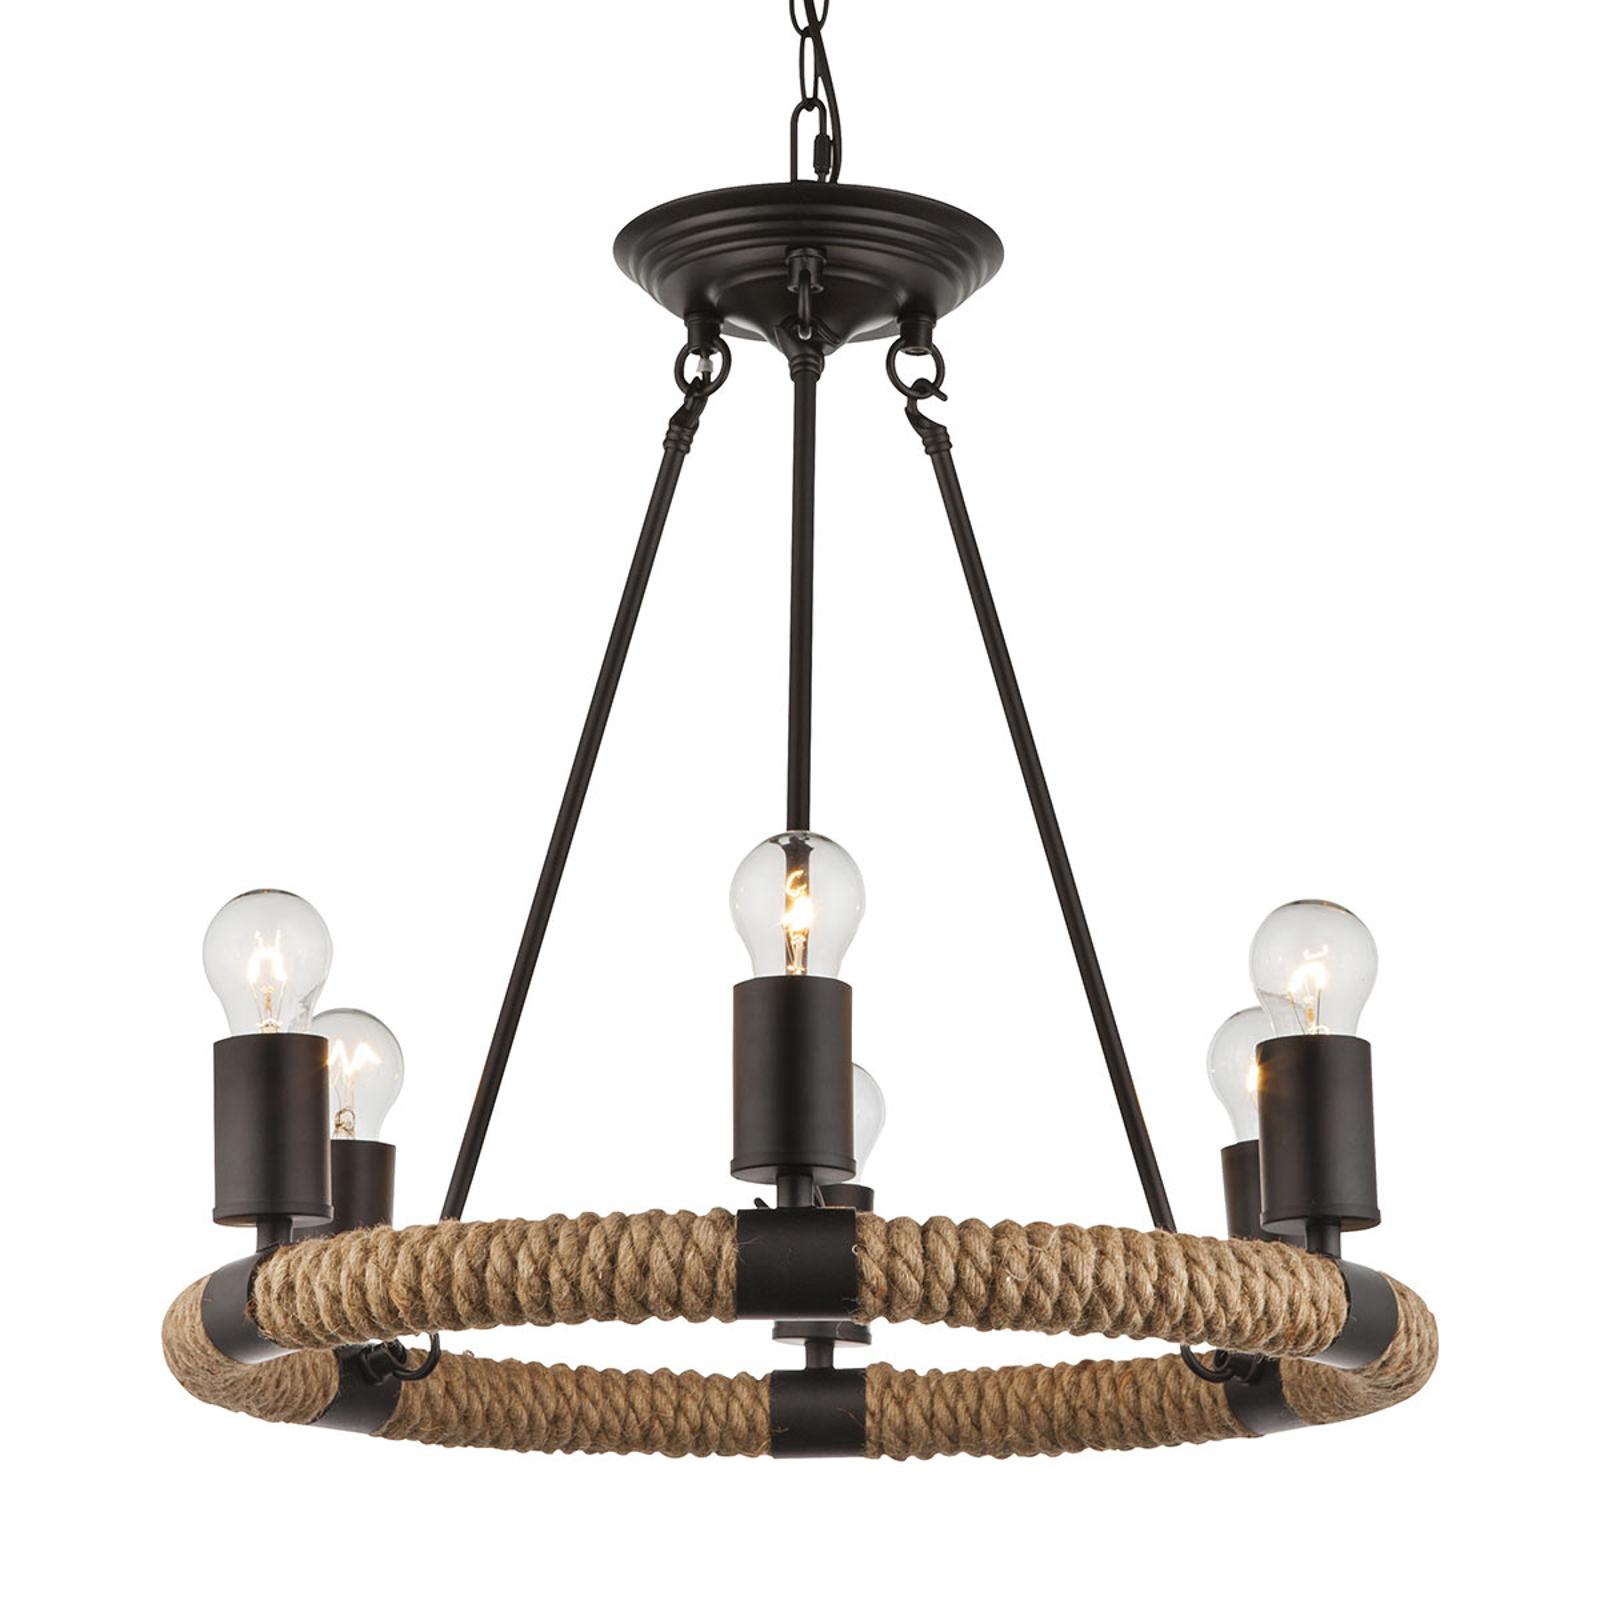 Okrągła lampa wisząca LED Ulleu 6-punktowa